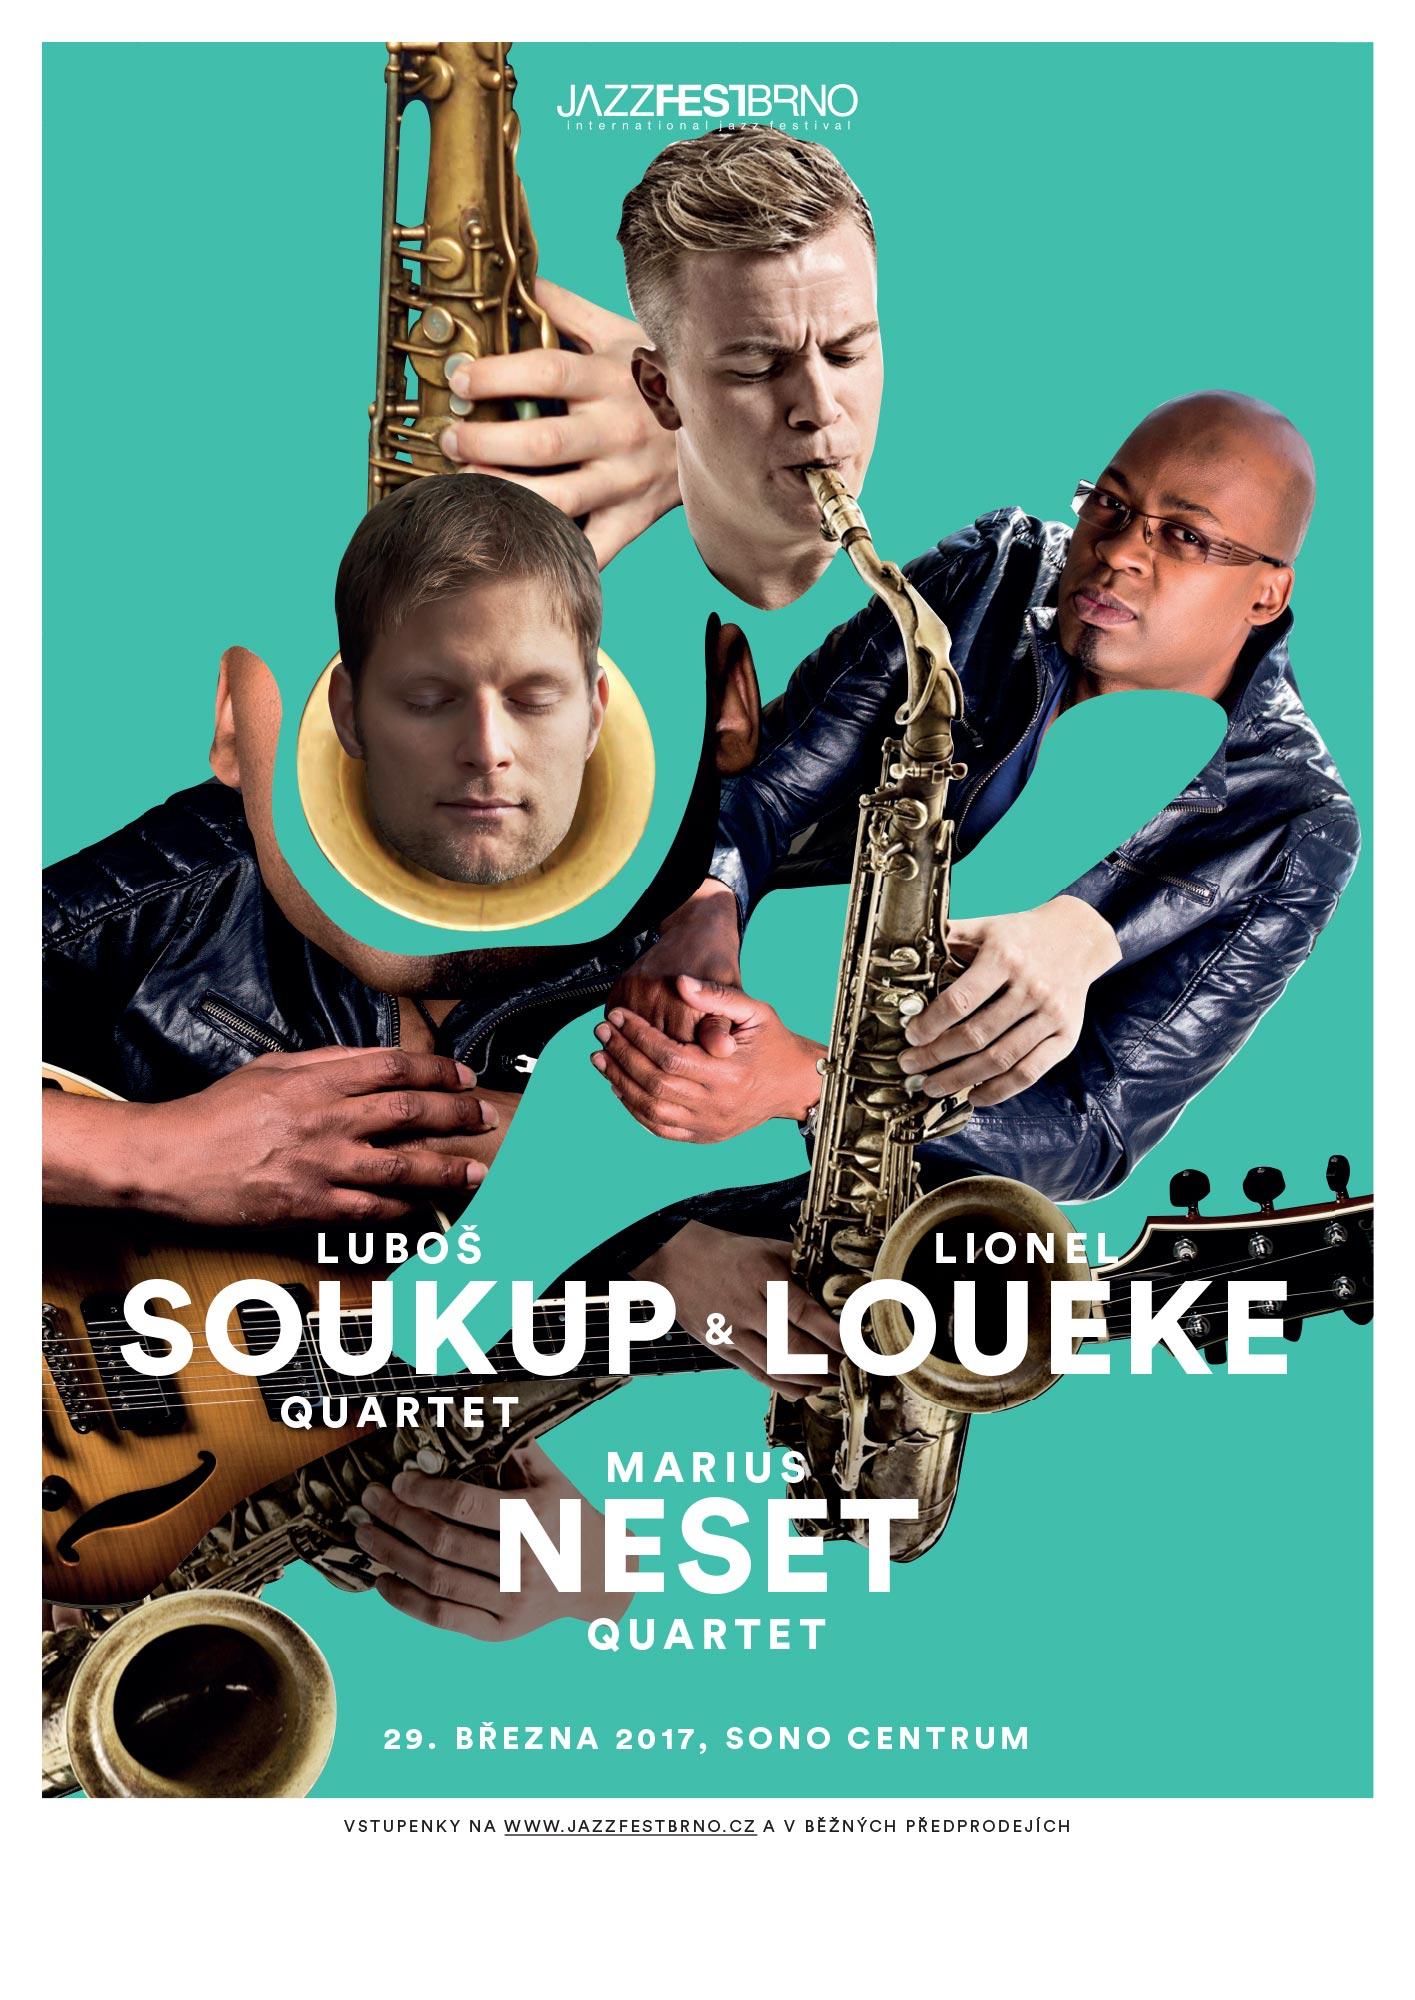 Jazzfestbrno 2017 - Soukup, Loueke, Neset